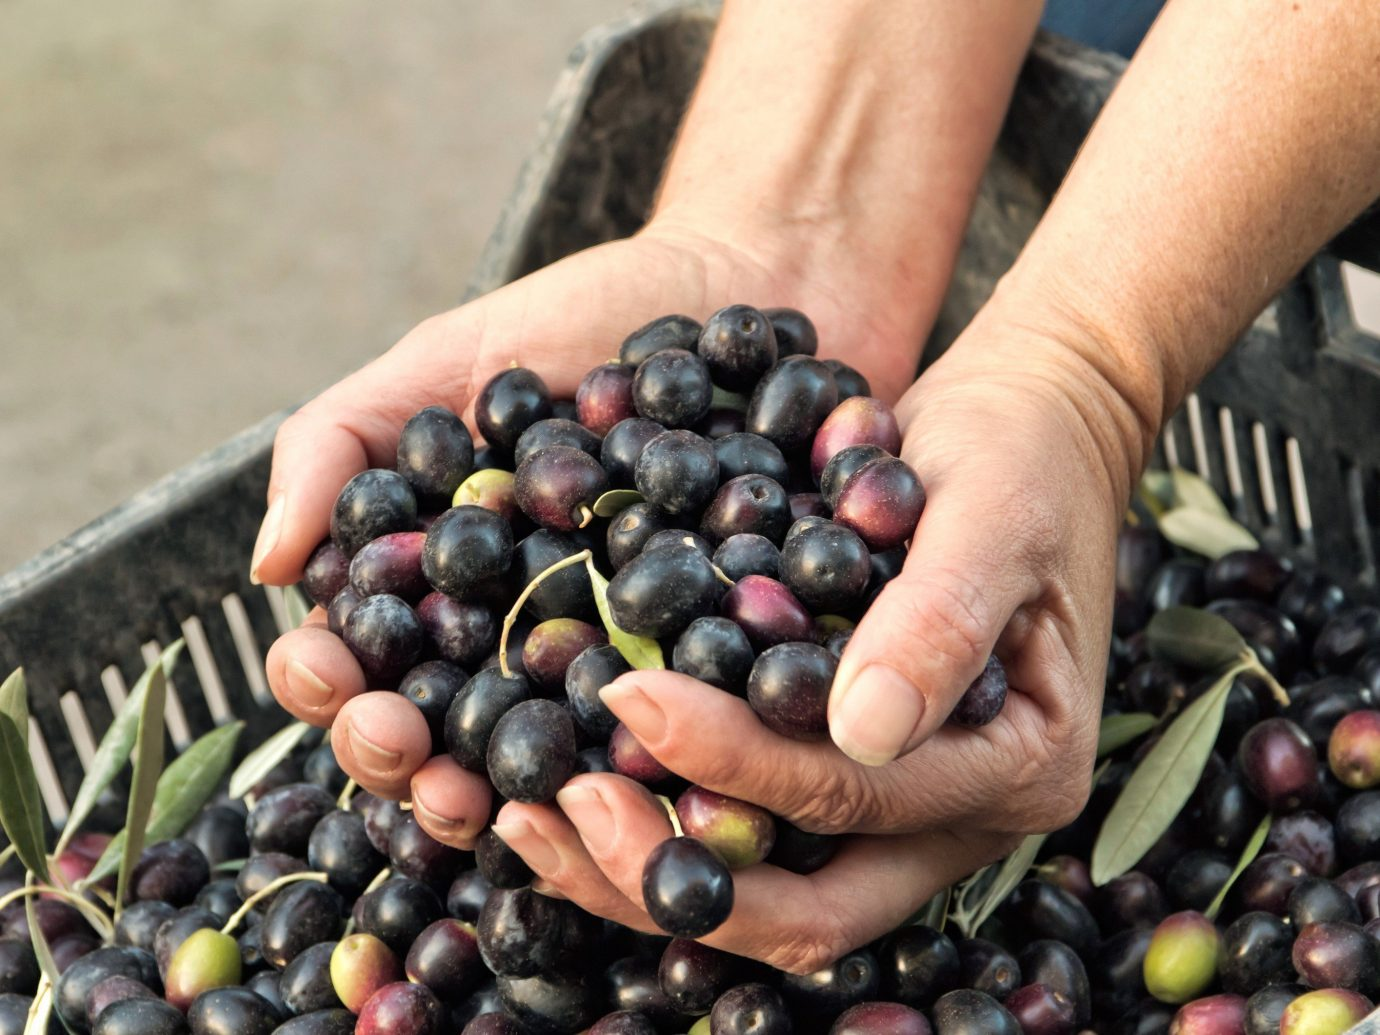 Trip Ideas person food produce fruit plant land plant berry olive flowering plant vegetable